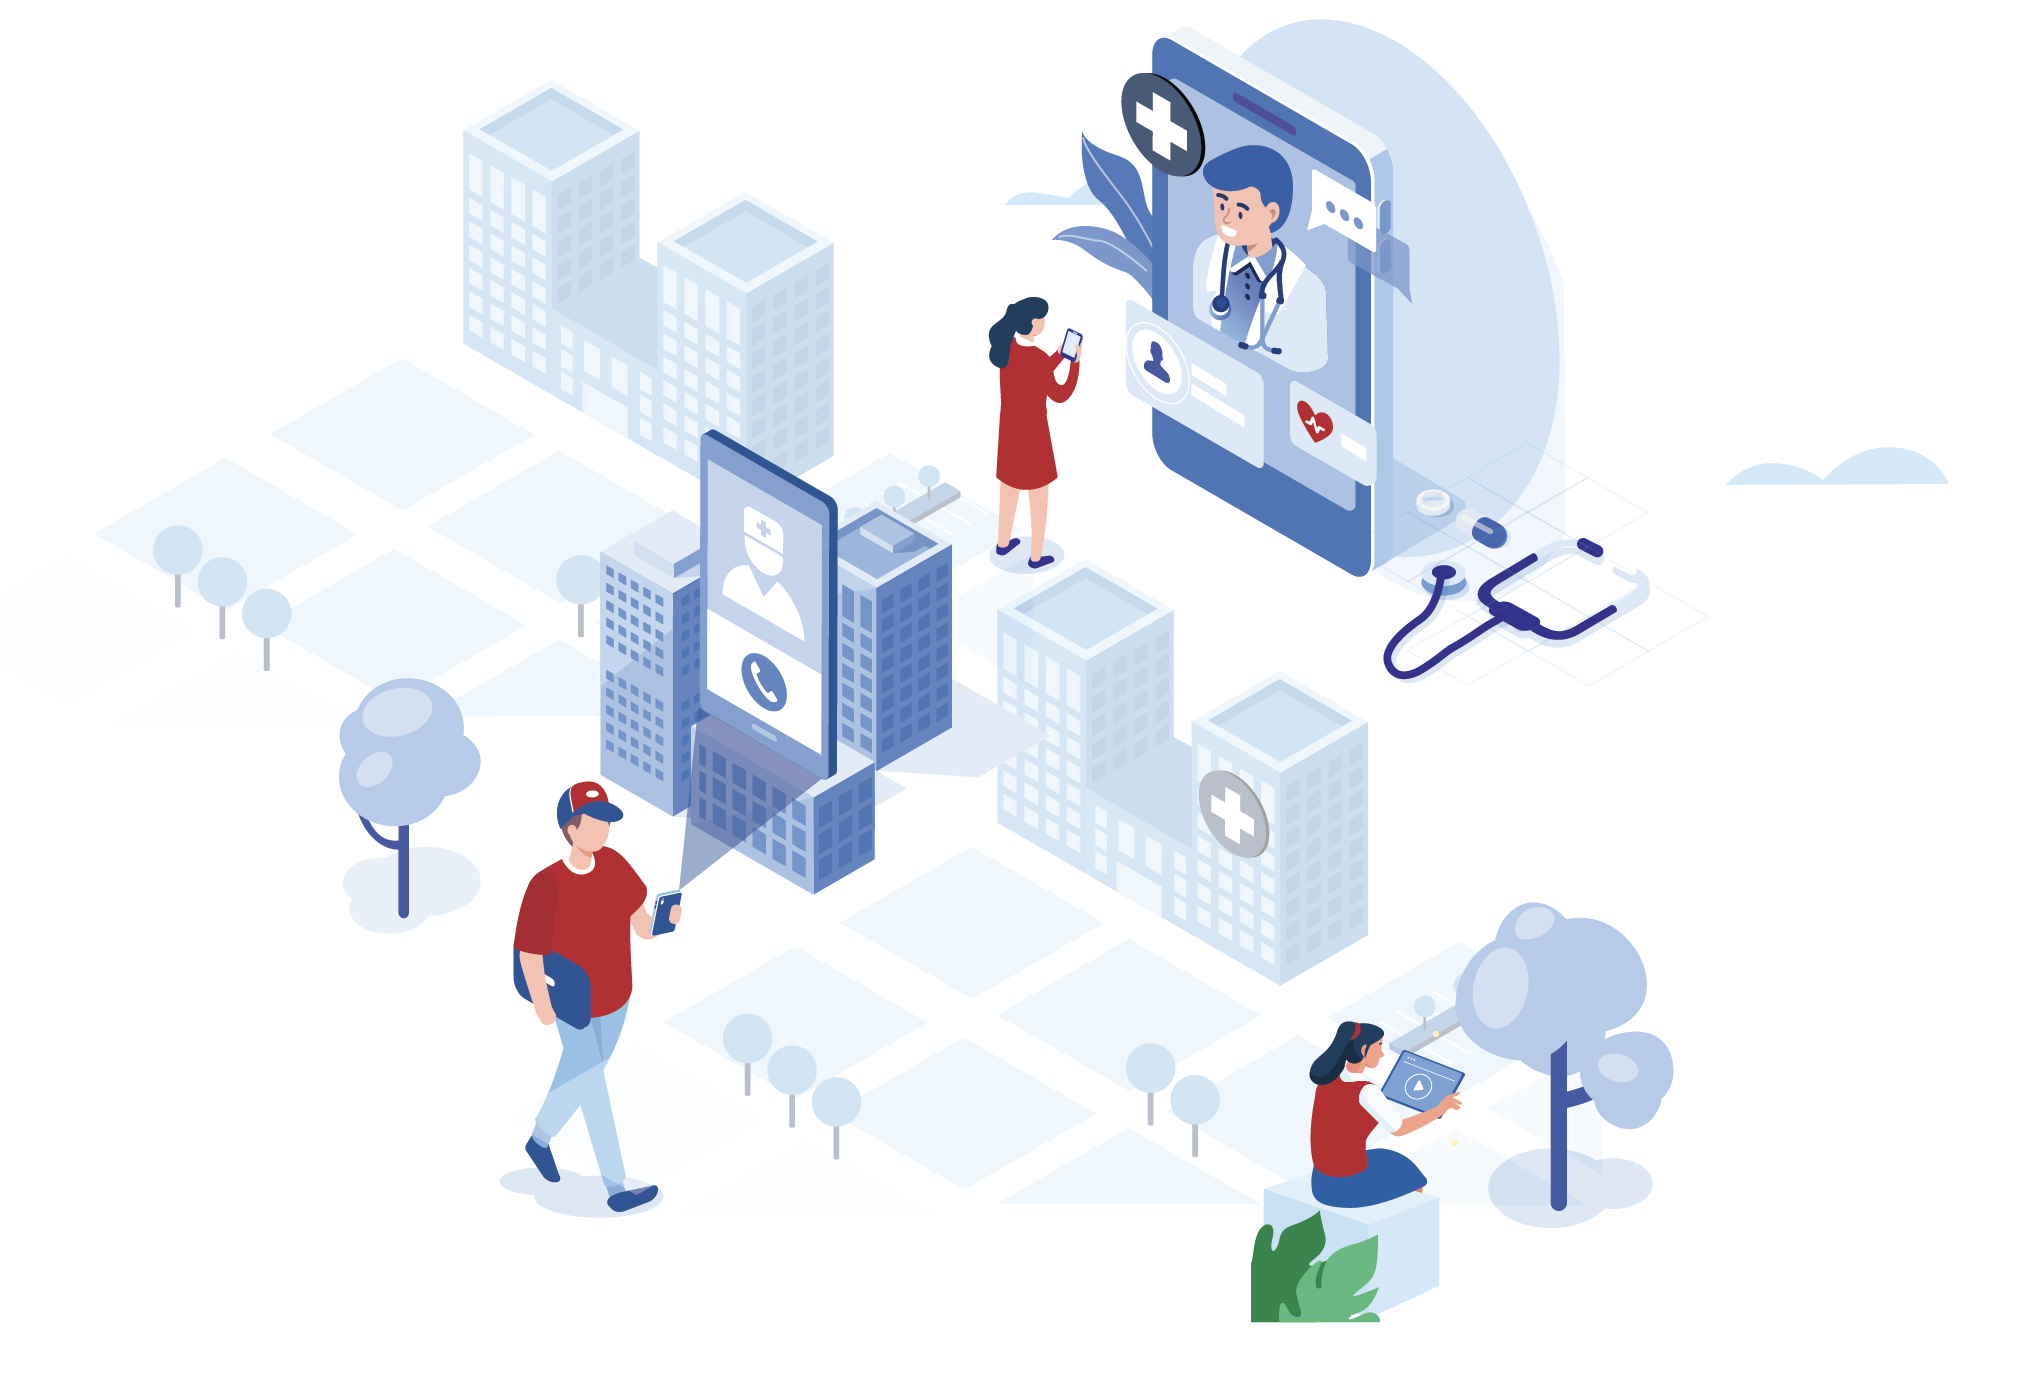 Telemedicine infographic illustration for Providertech